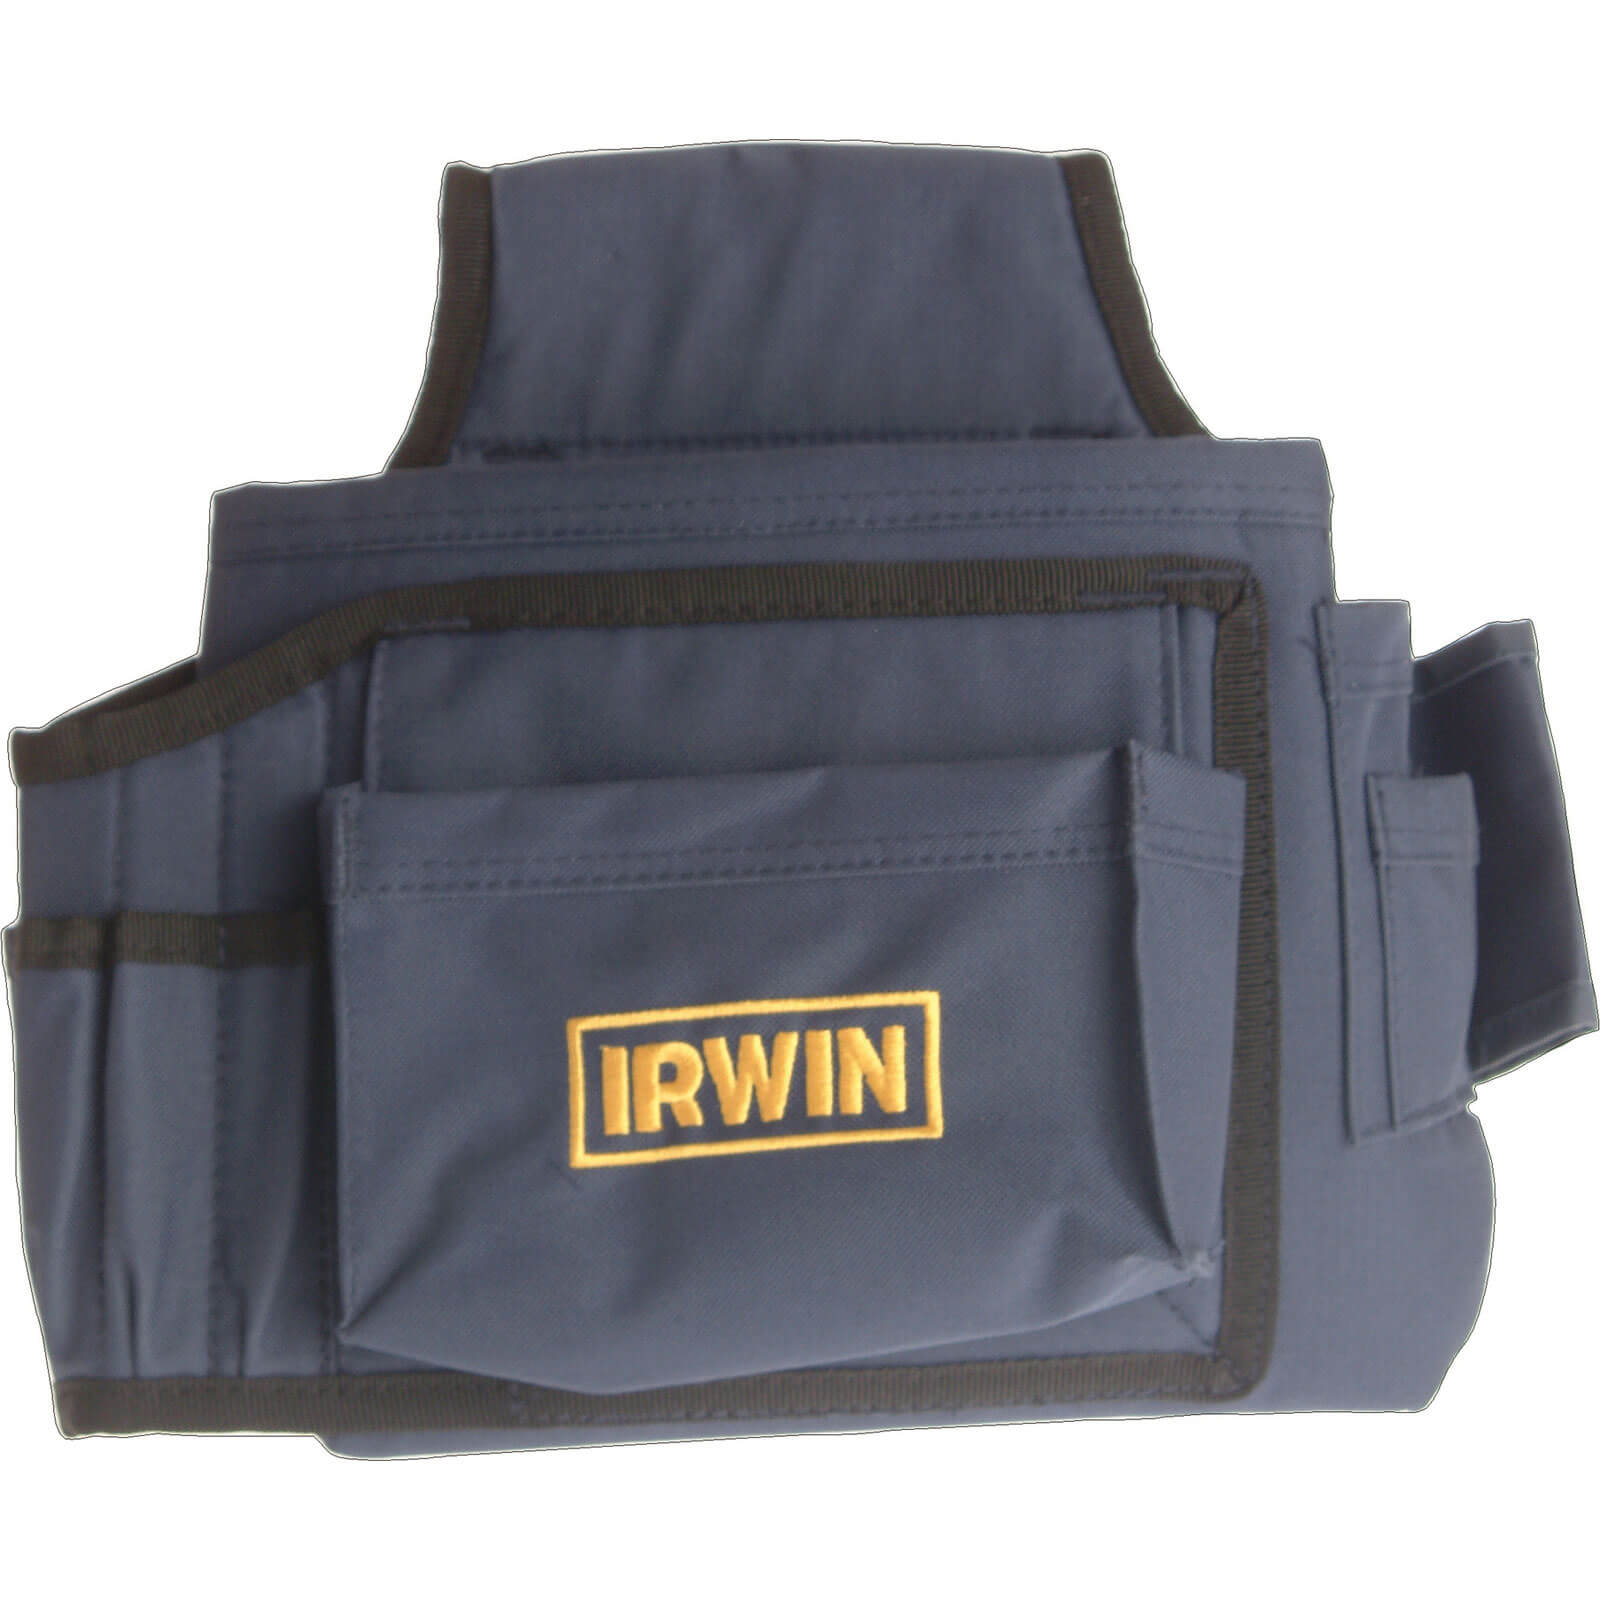 Irwin Builders Utility Pouch